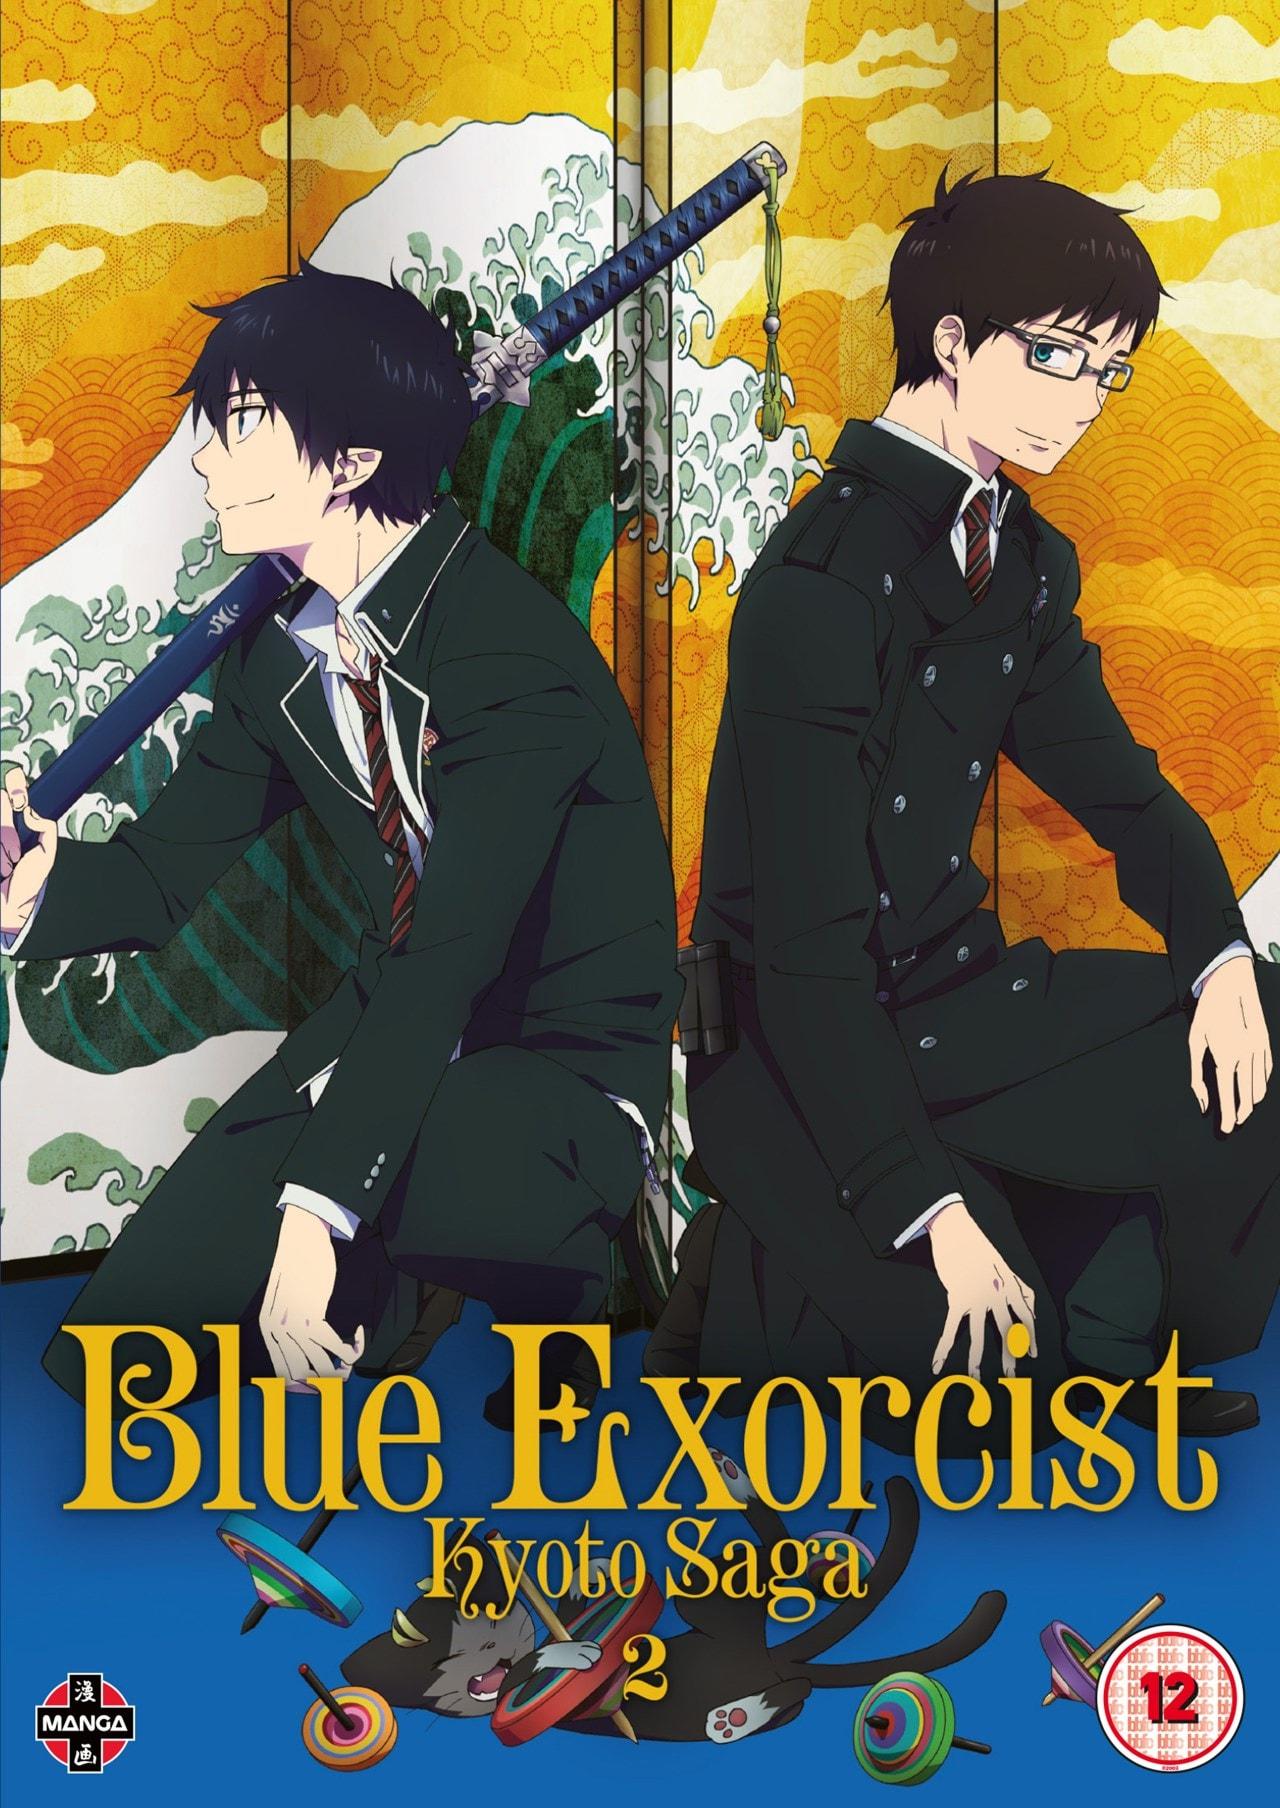 Blue Exorcist: Season 2 - Kyoto Saga Volume 2 - 1